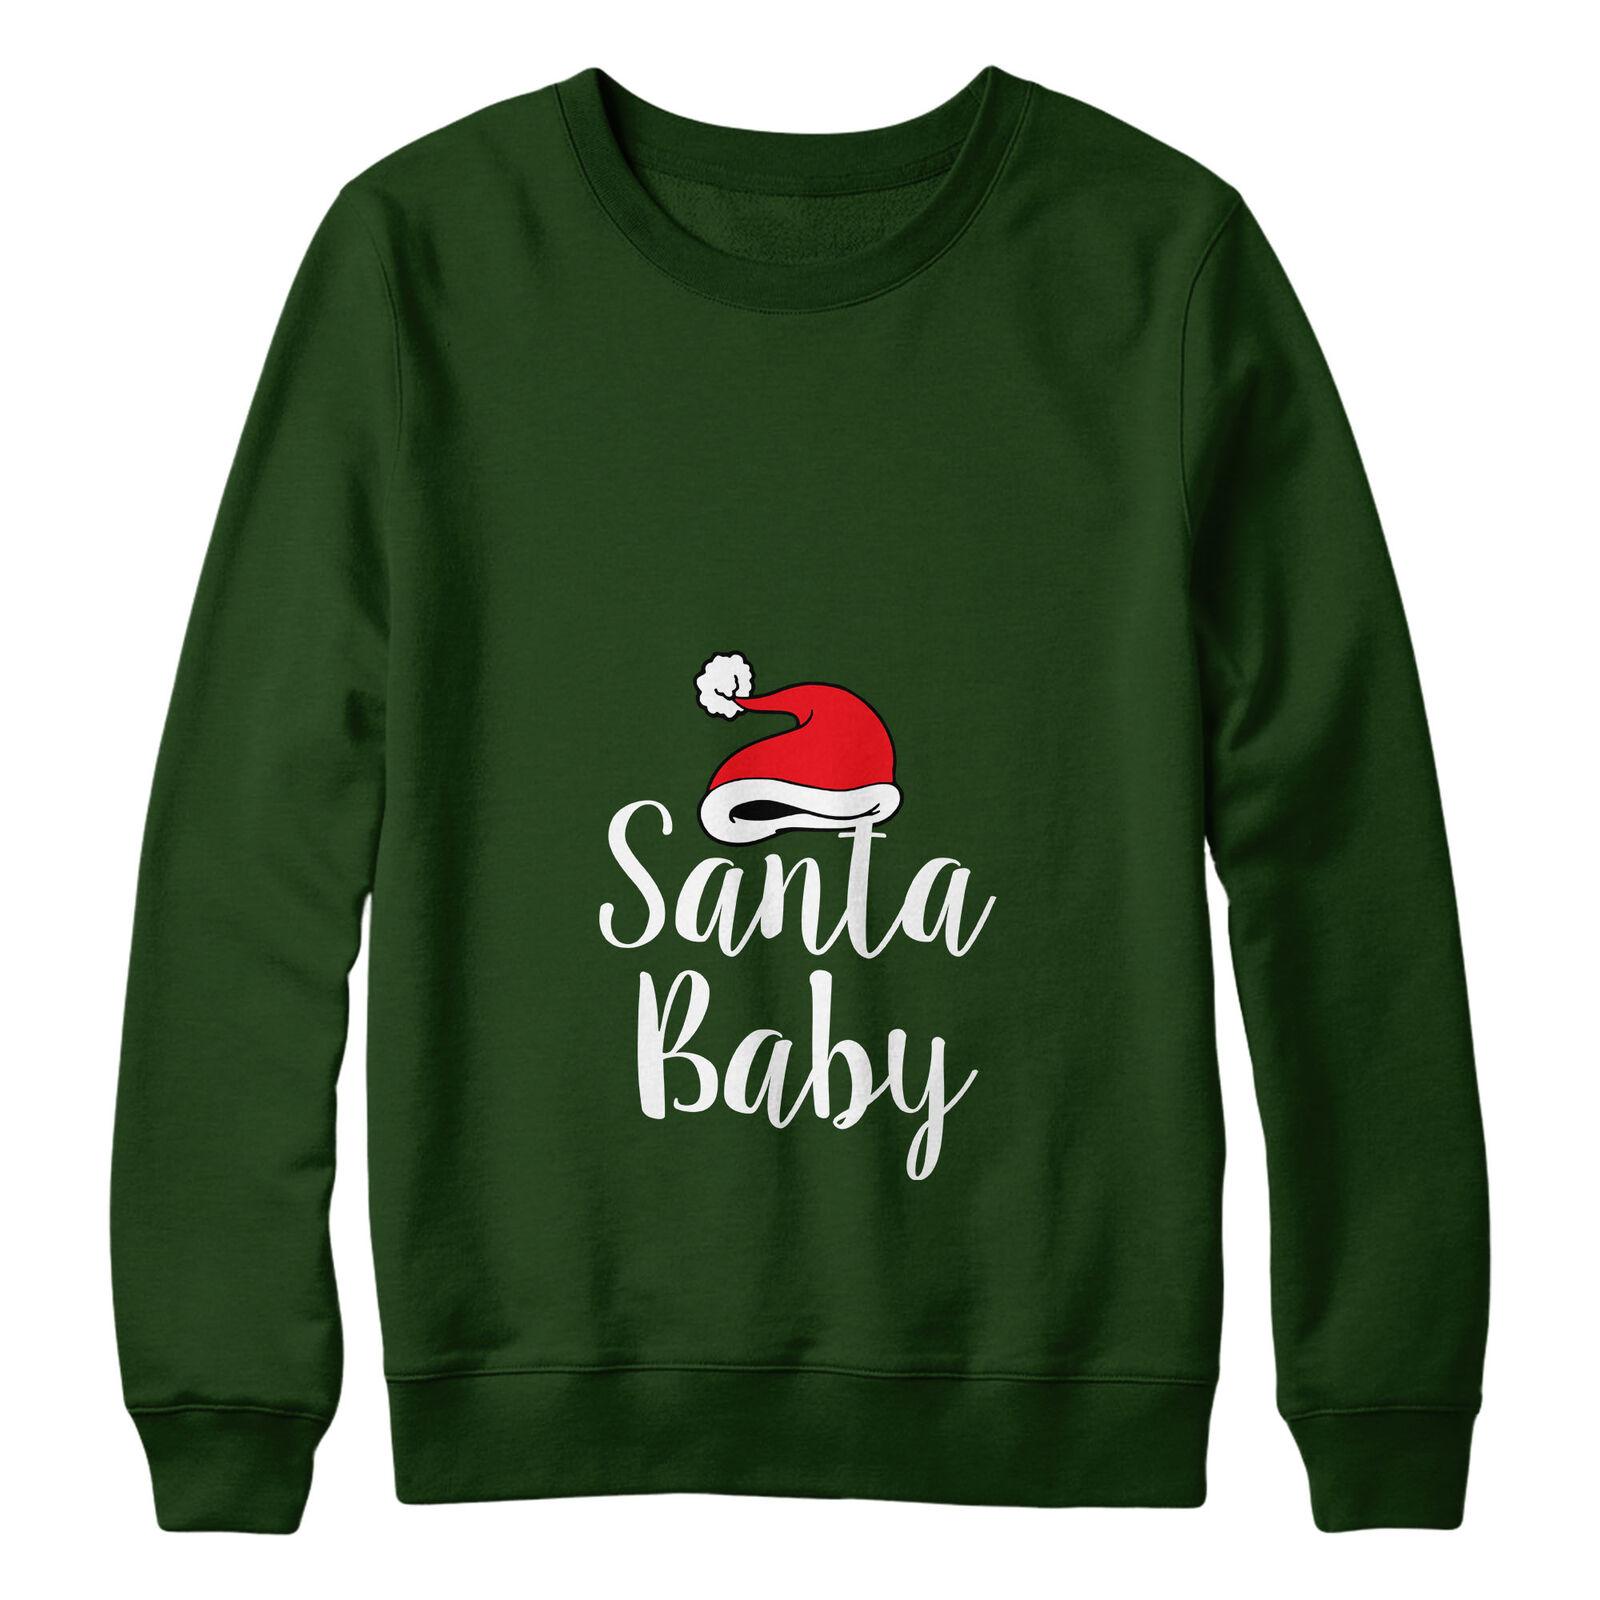 Santa Baby Maternity Sweater Jumper Christmas Women Xmas Funny Pregnant 162